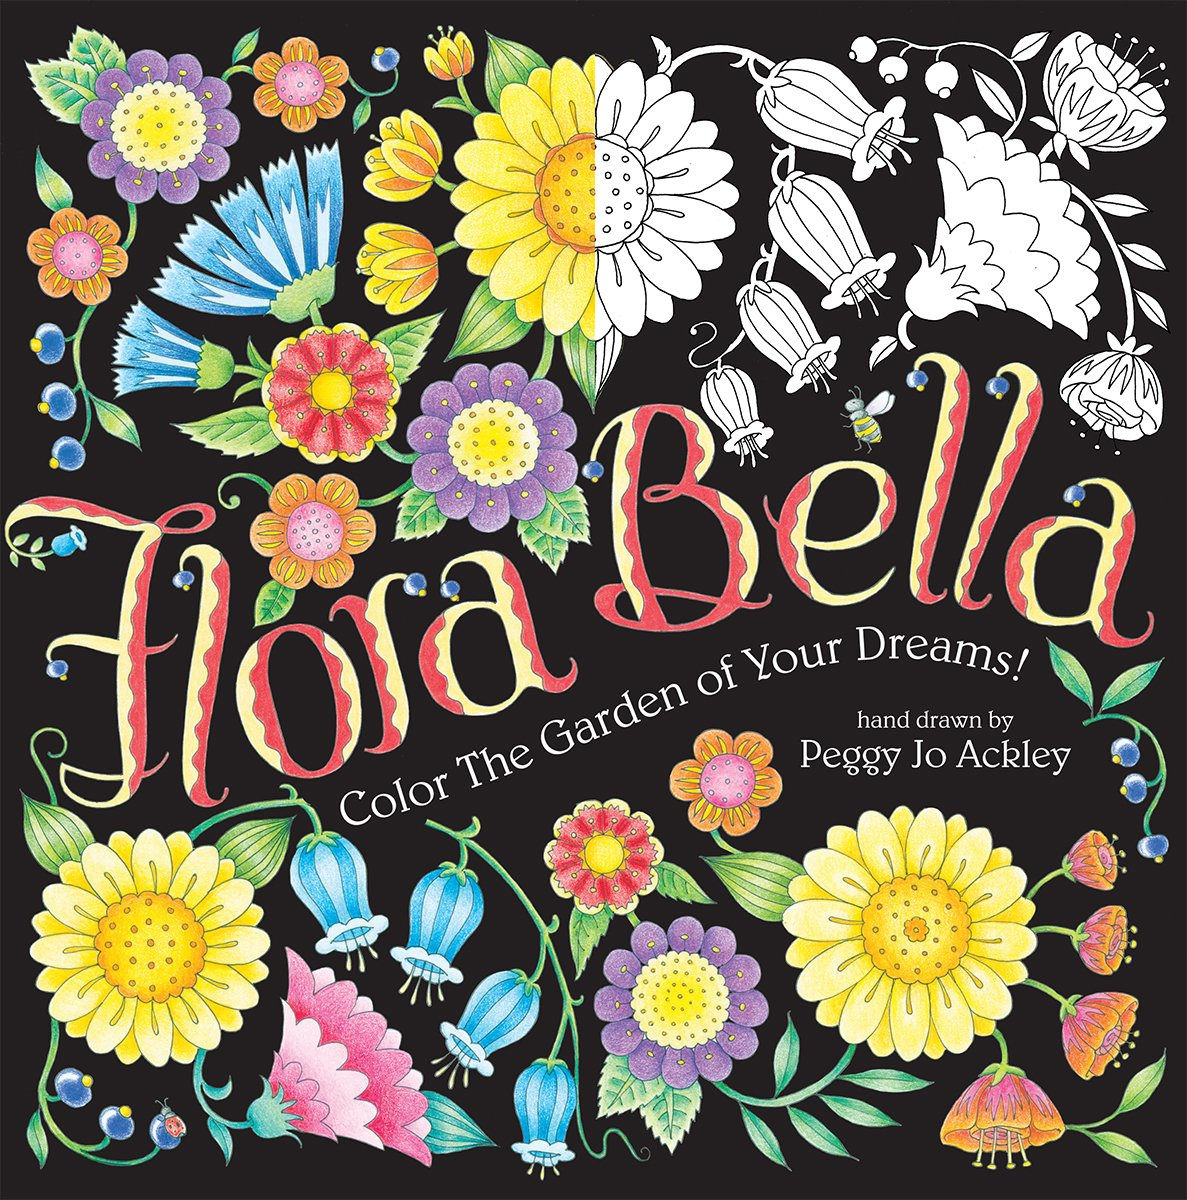 Flora Bella: Color the Garden of Your Dreams! Colouring Books: Amazon.es: Ackley, Peggy Jo: Libros en idiomas extranjeros